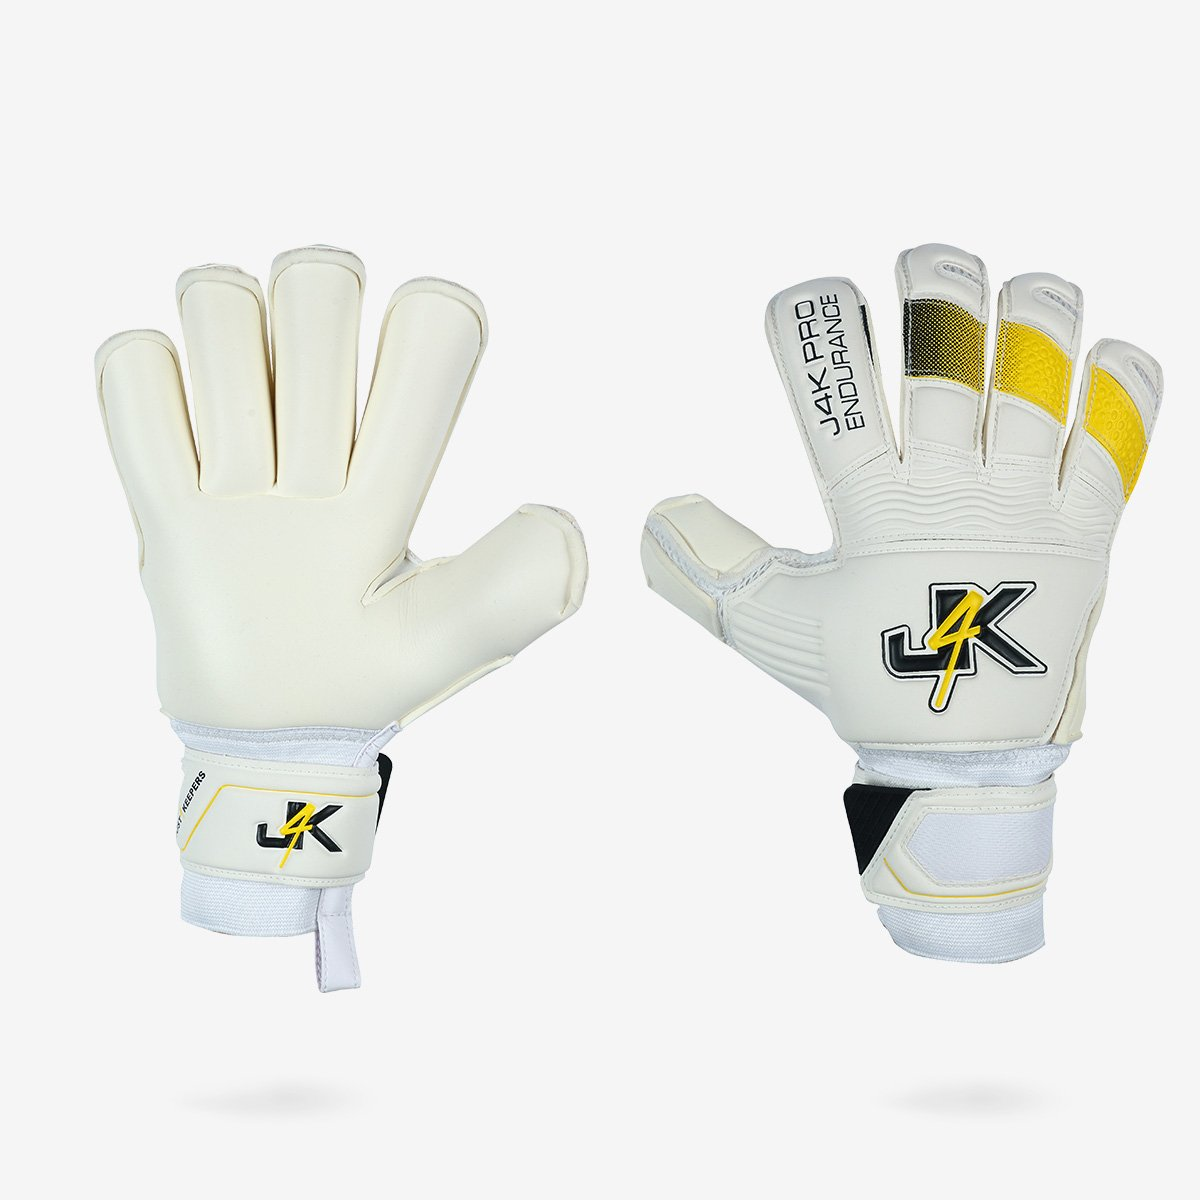 j4 K Ultimate Pro指セーバーGoalieゴールキーパーサッカーの市場で最高のグローブ(サイズ7 ) B077X573W3